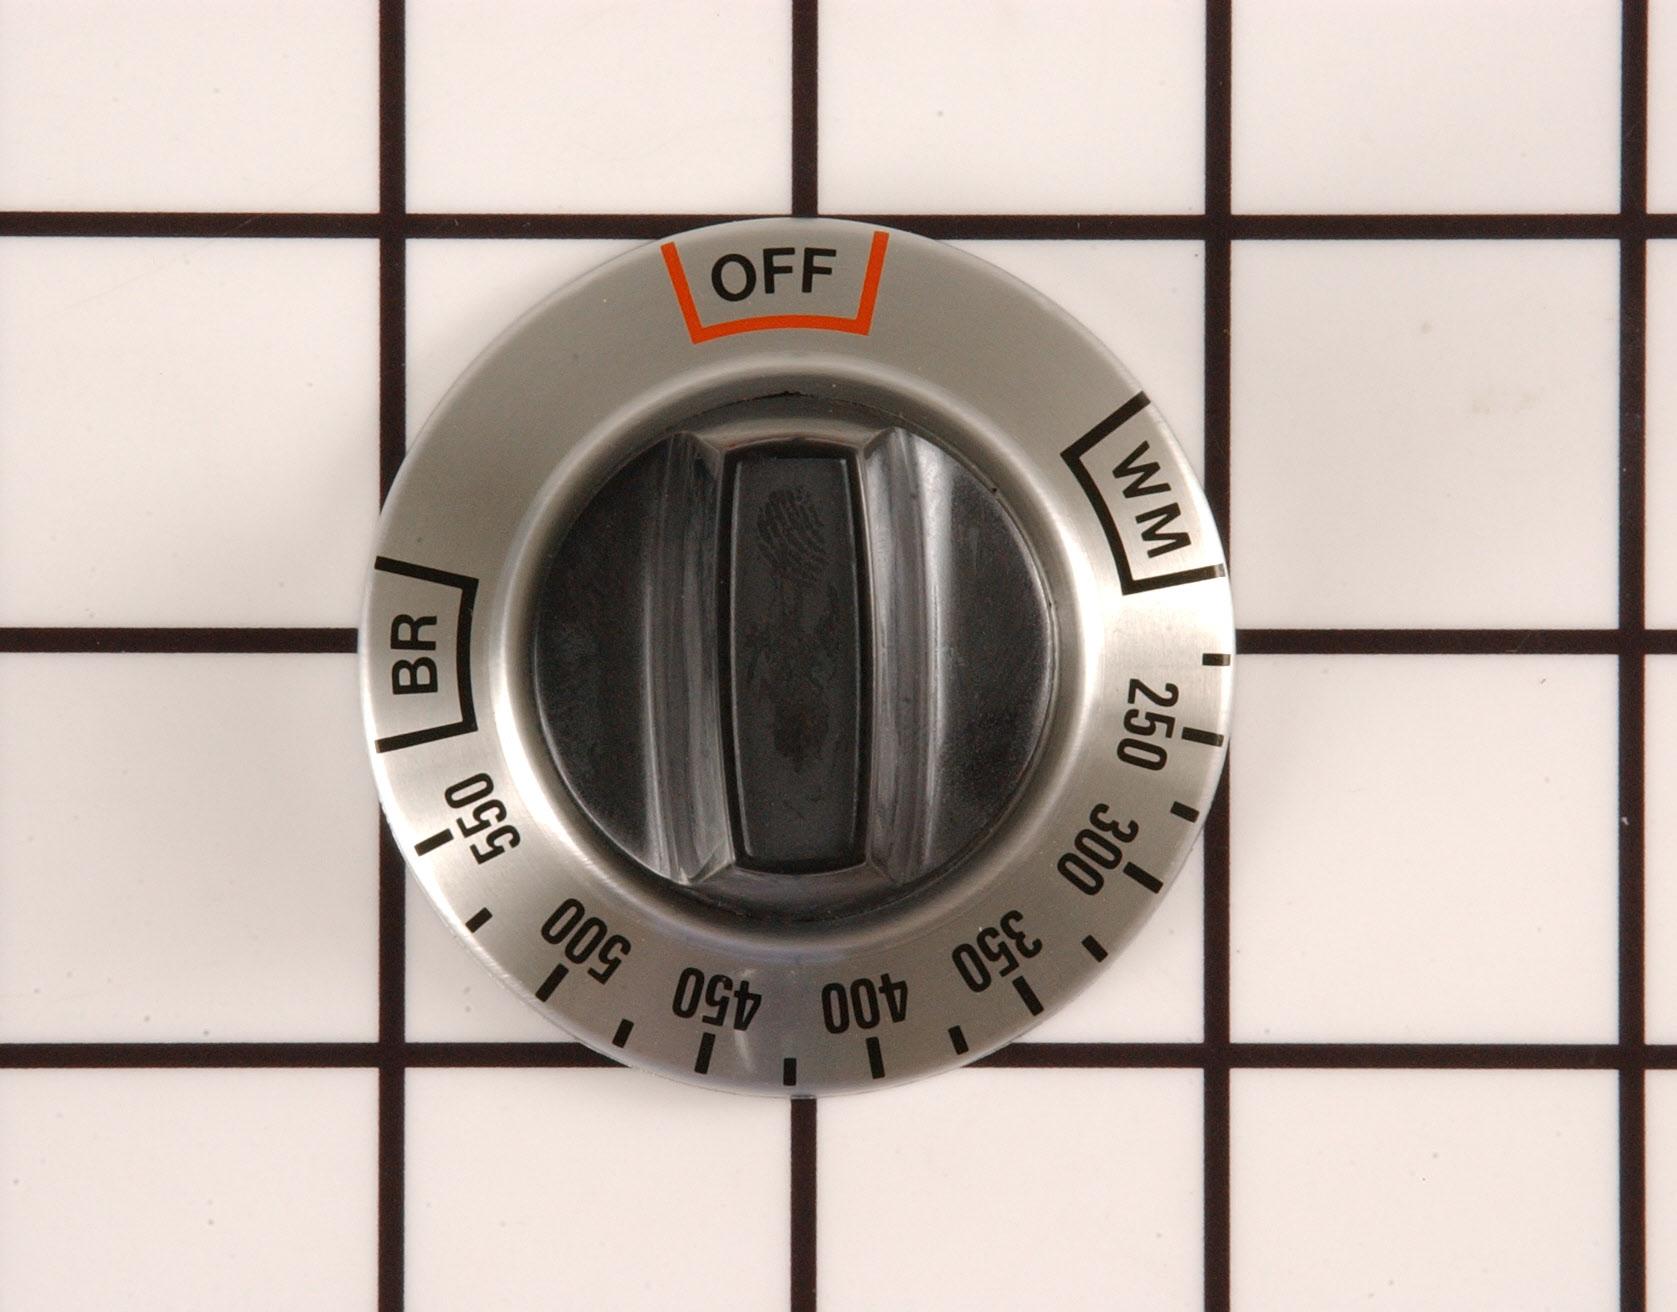 Maytag Range/Stove/Oven Part # 7731P013-60 - Thermostat Knob